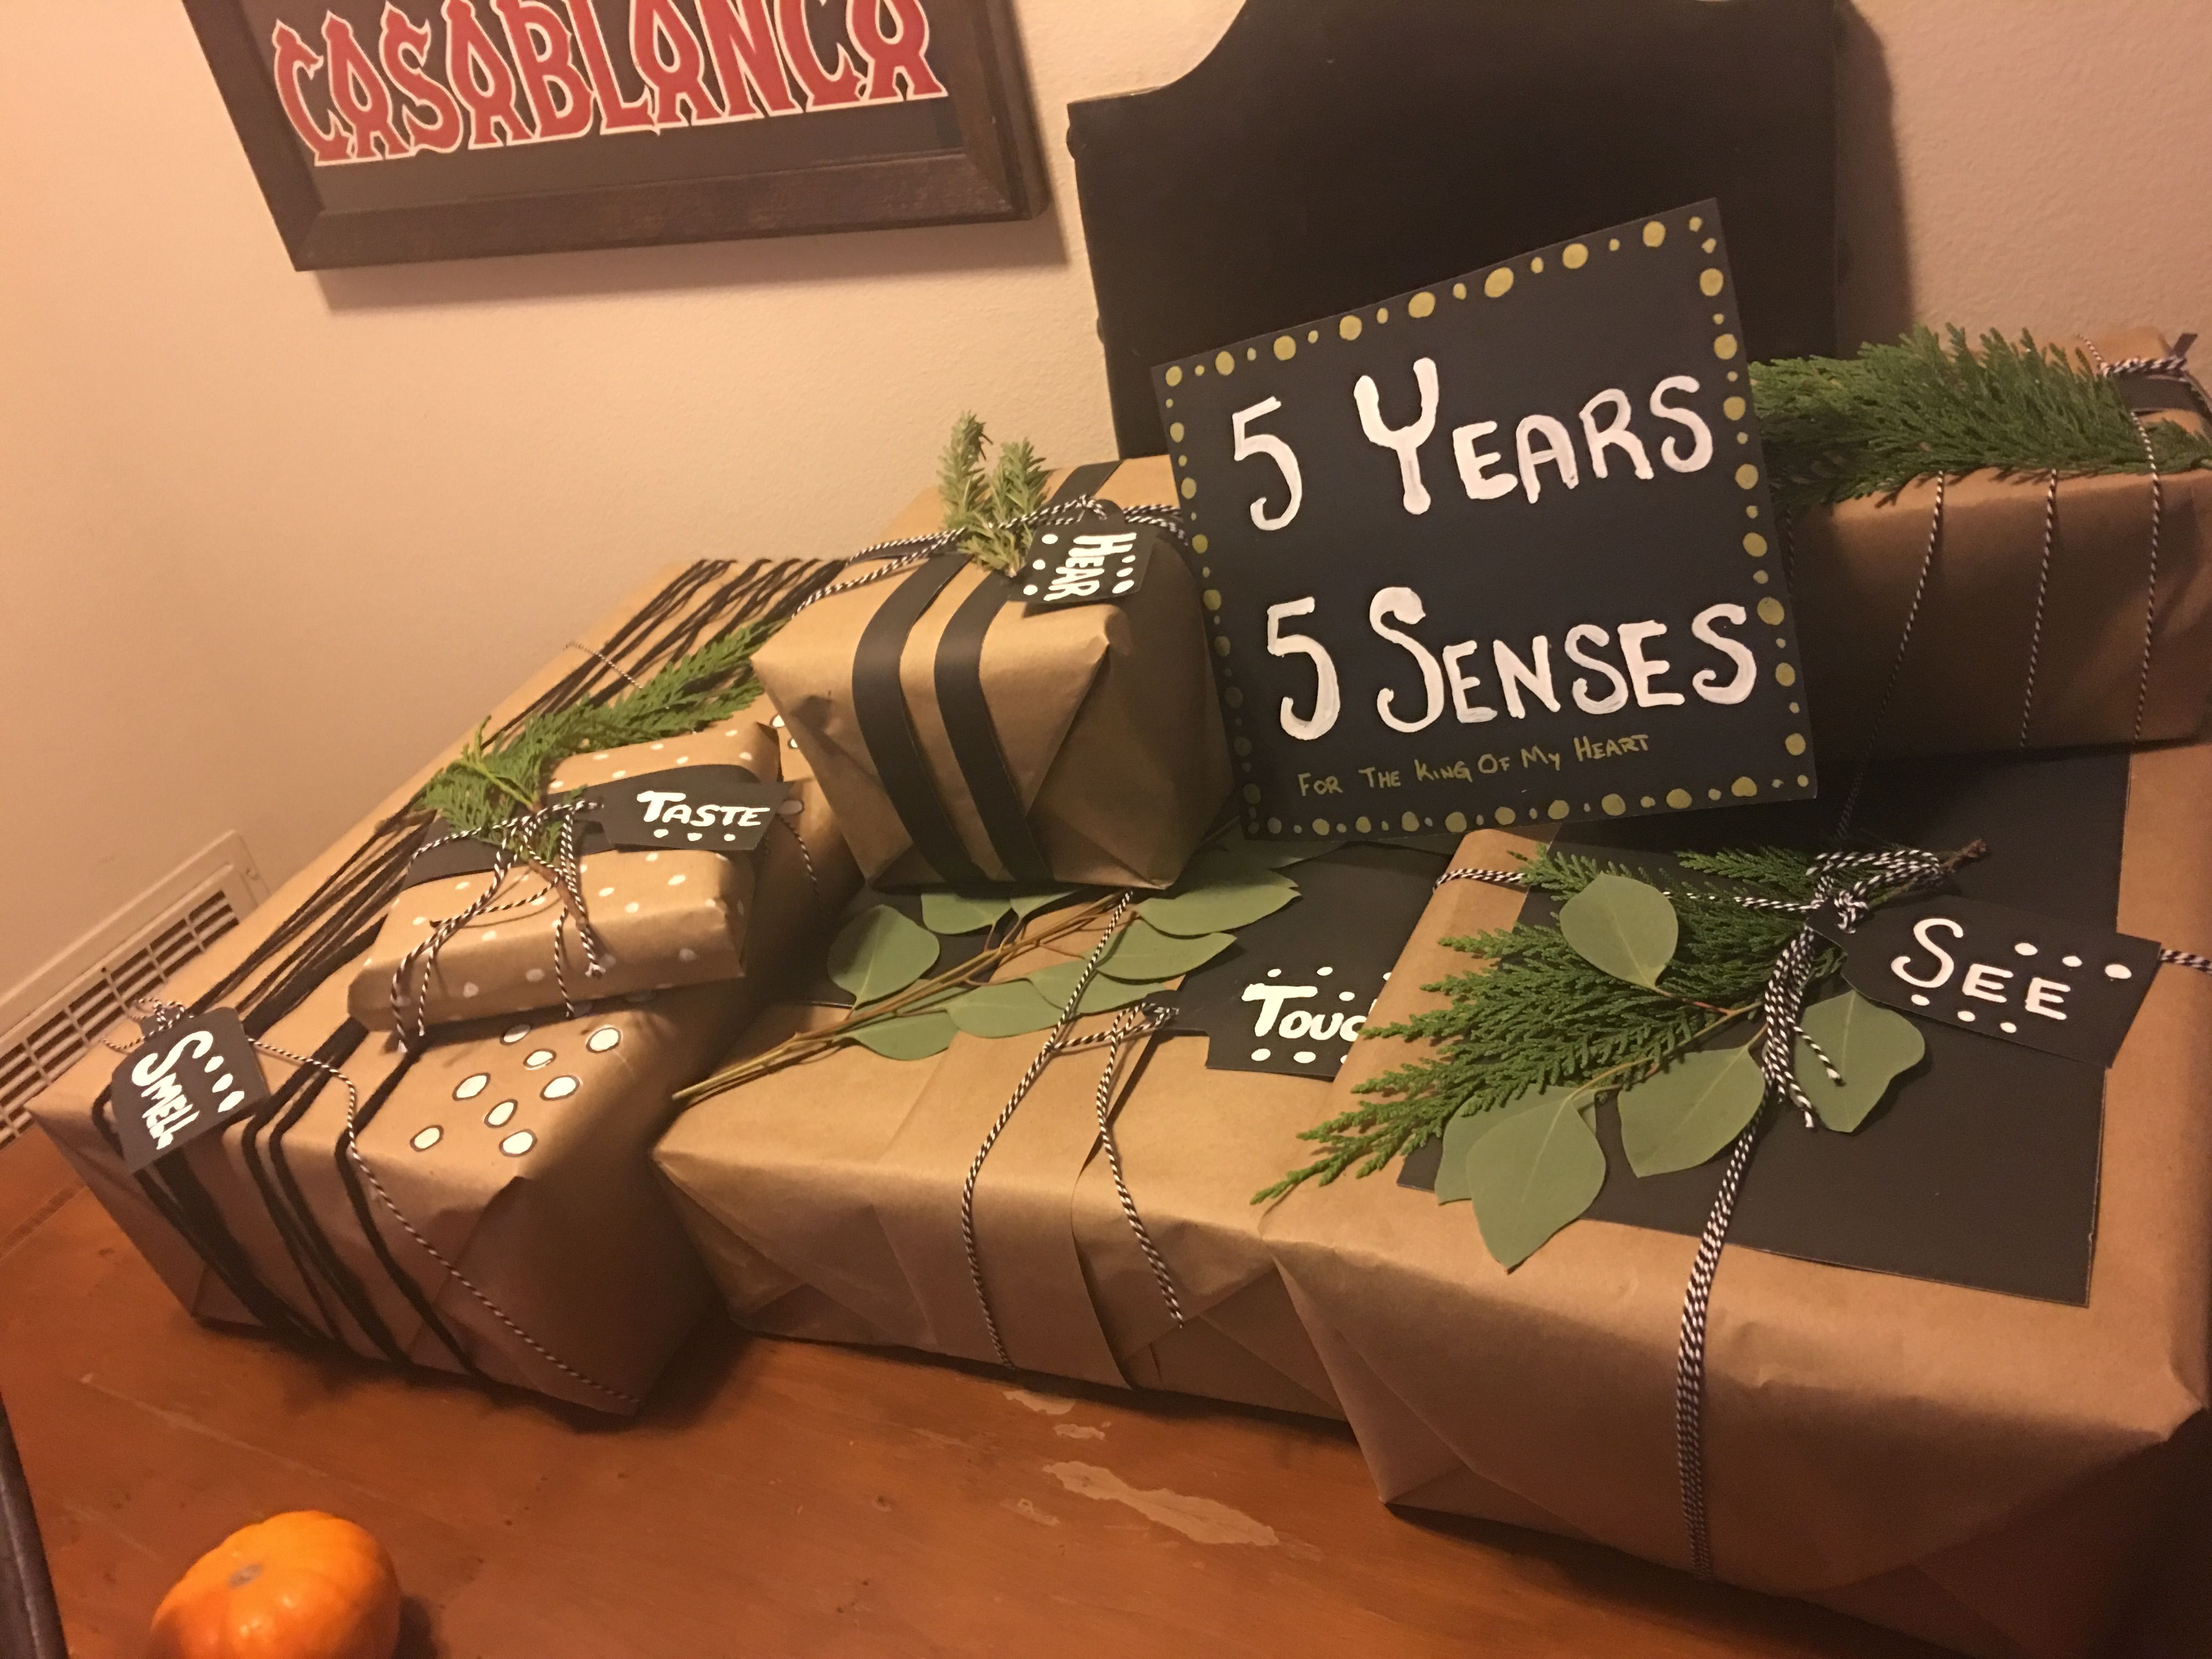 5 Senses Gift For Him 5 Year Anniversary 4th Year Anniversary Gifts Birthday Gifts For